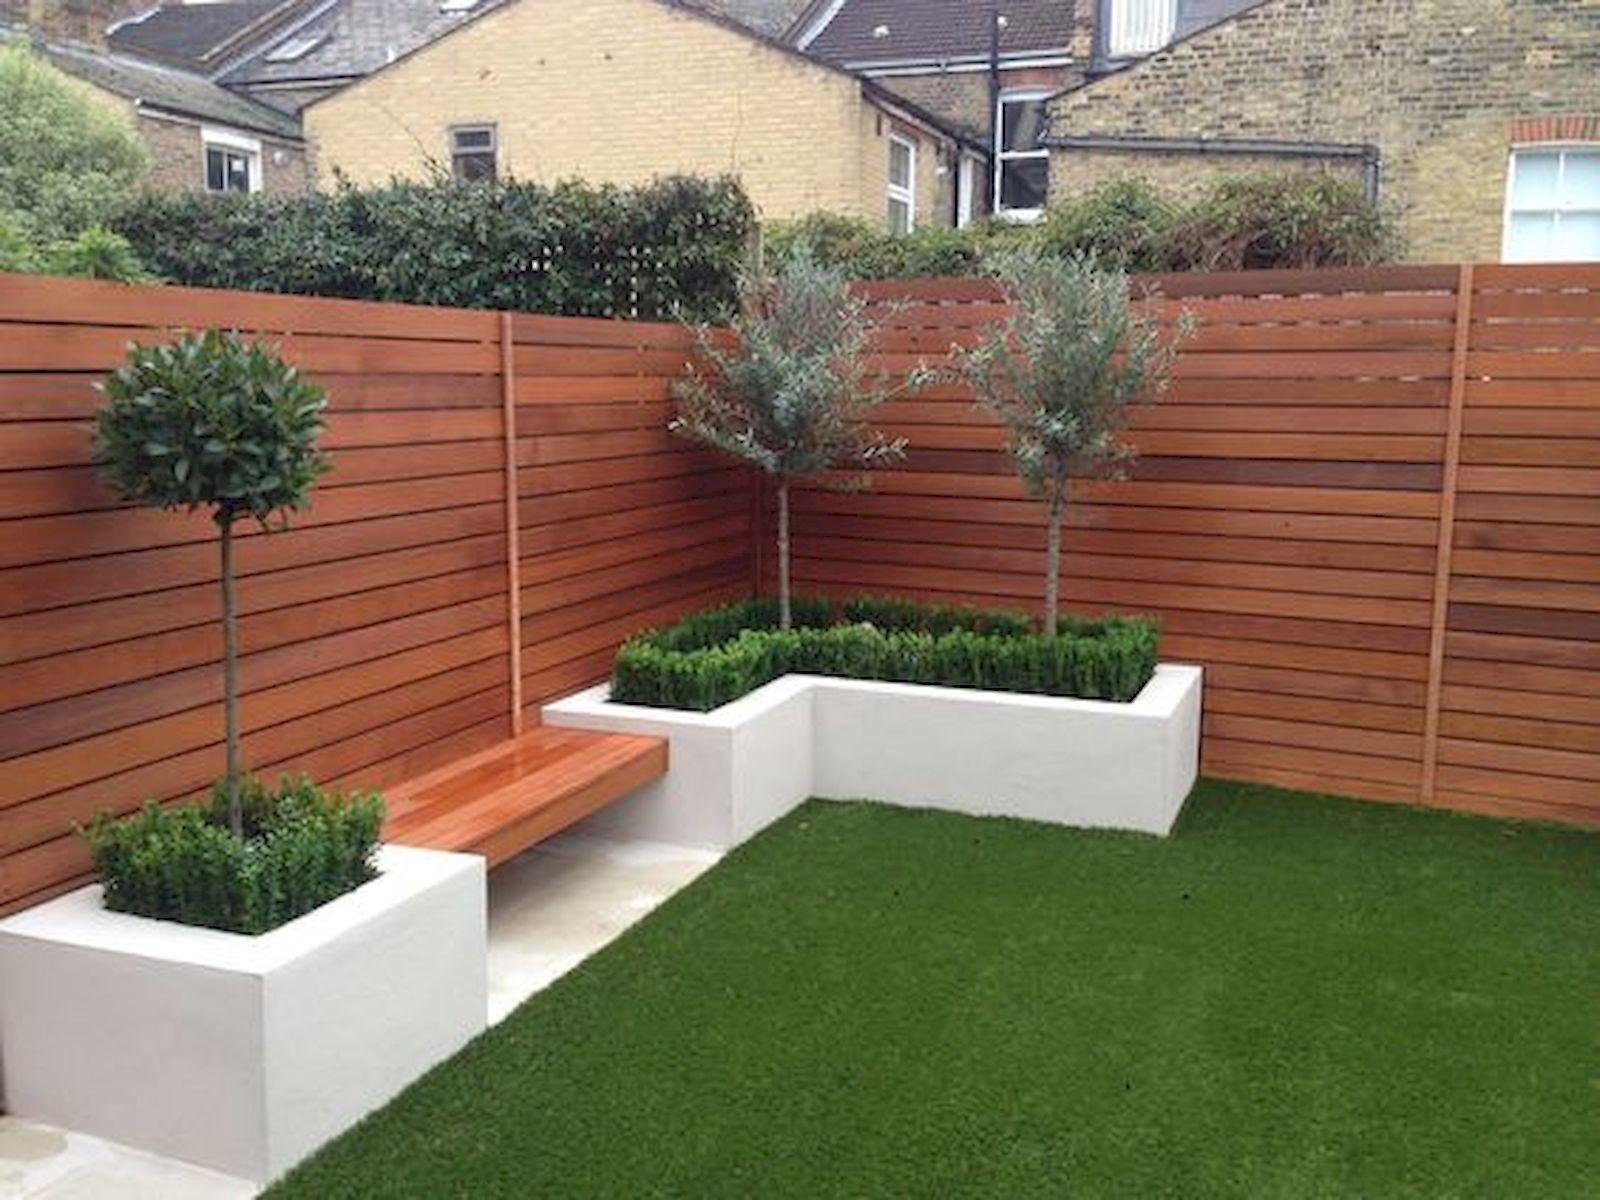 57 Gorgeous Garden Fence Design Ideas 22 Fence Design Backyard Fences Small Garden Design Backyard garden fence ideas